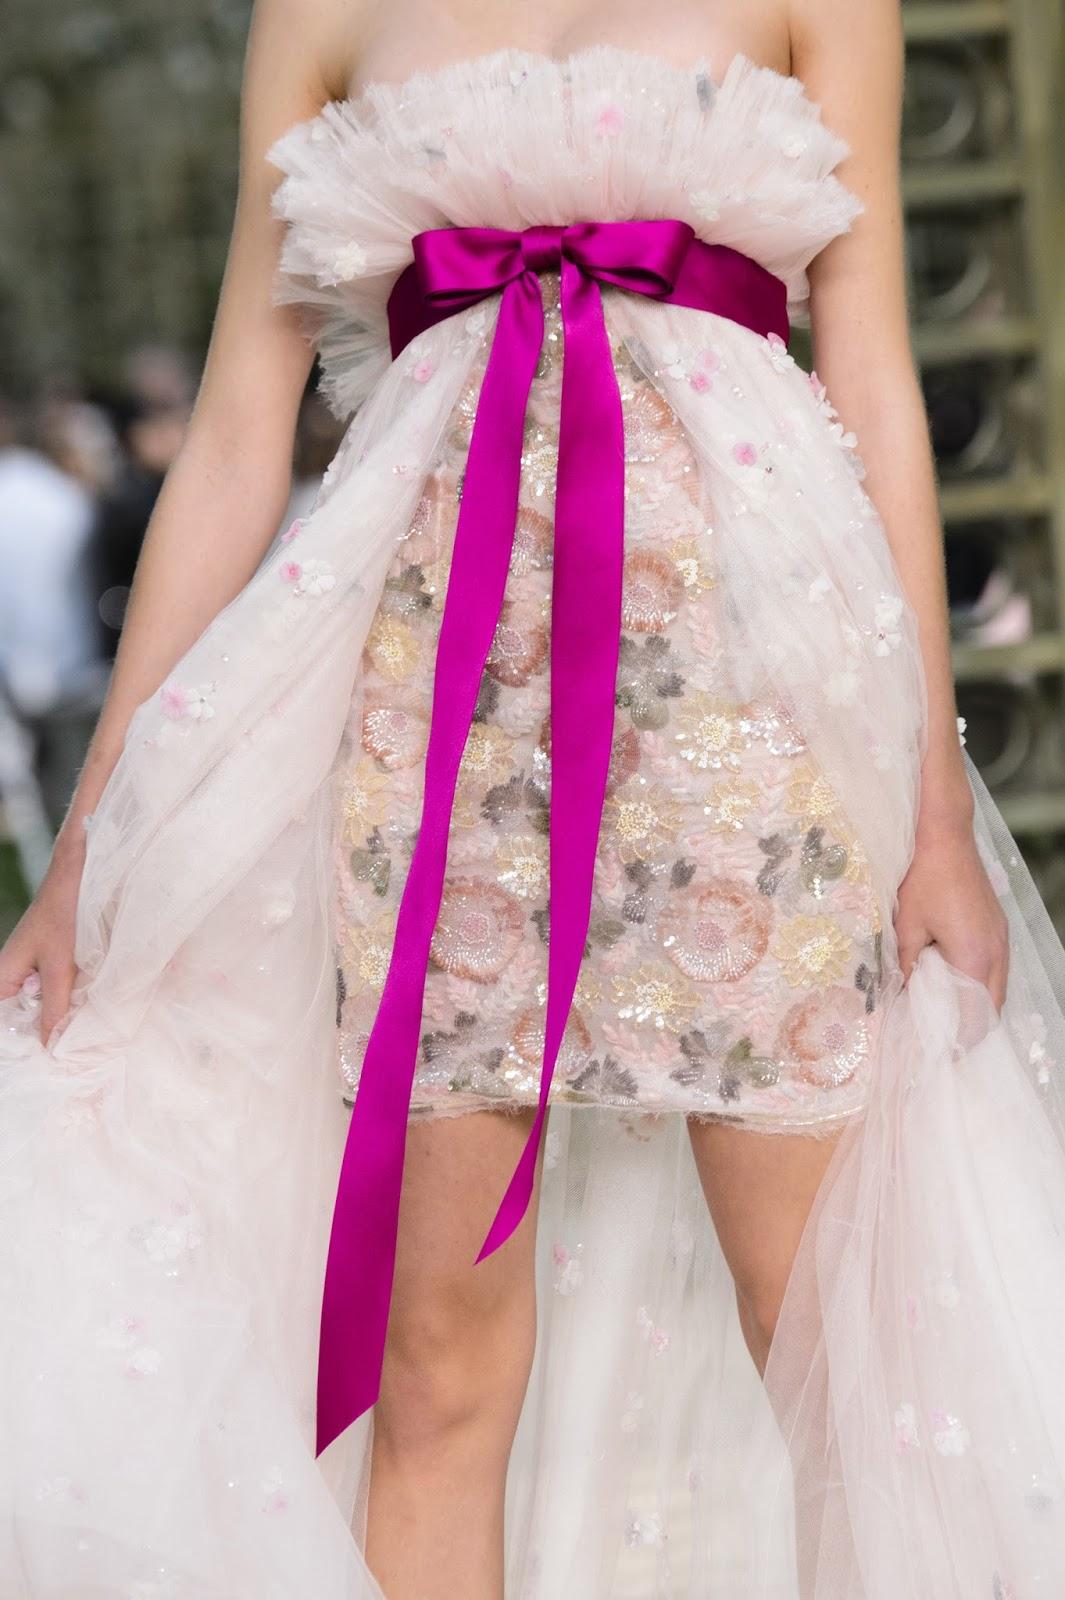 Chanel Couture: PART II January 26, 2018 | ZsaZsa Bellagio - Like No ...